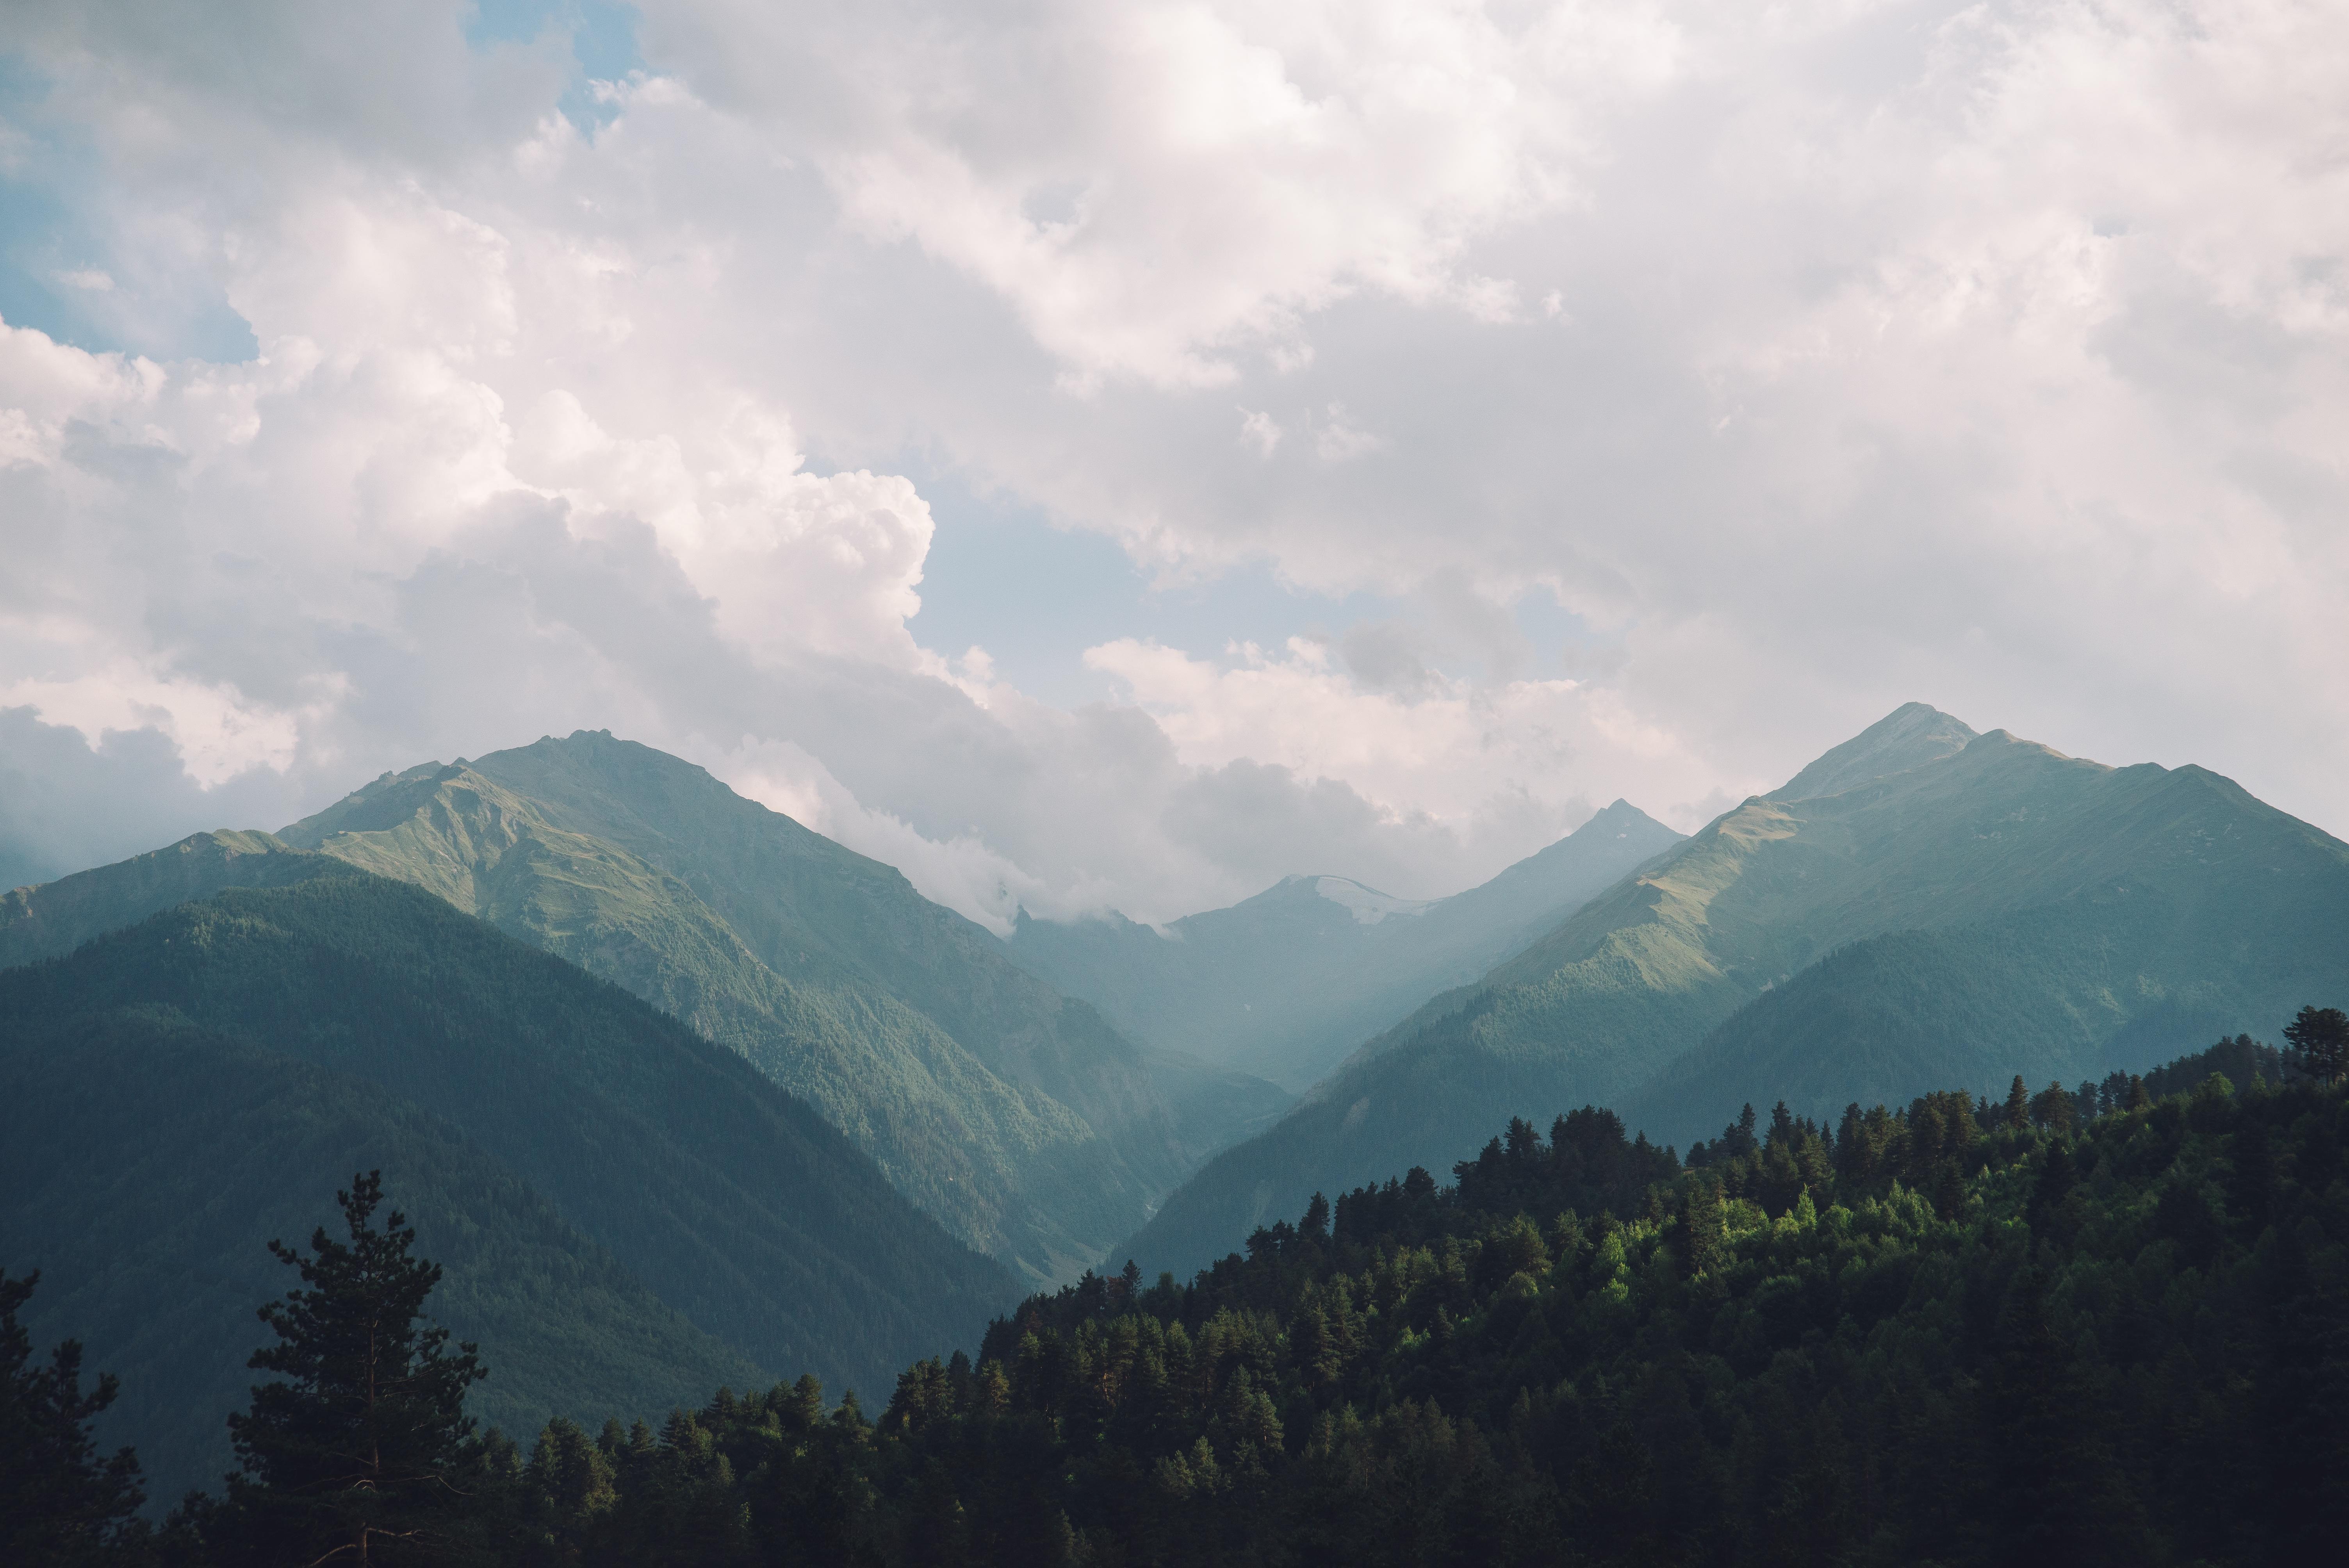 Beauty of Nature, Beauty, Cloud, Cloudy, Green, HQ Photo